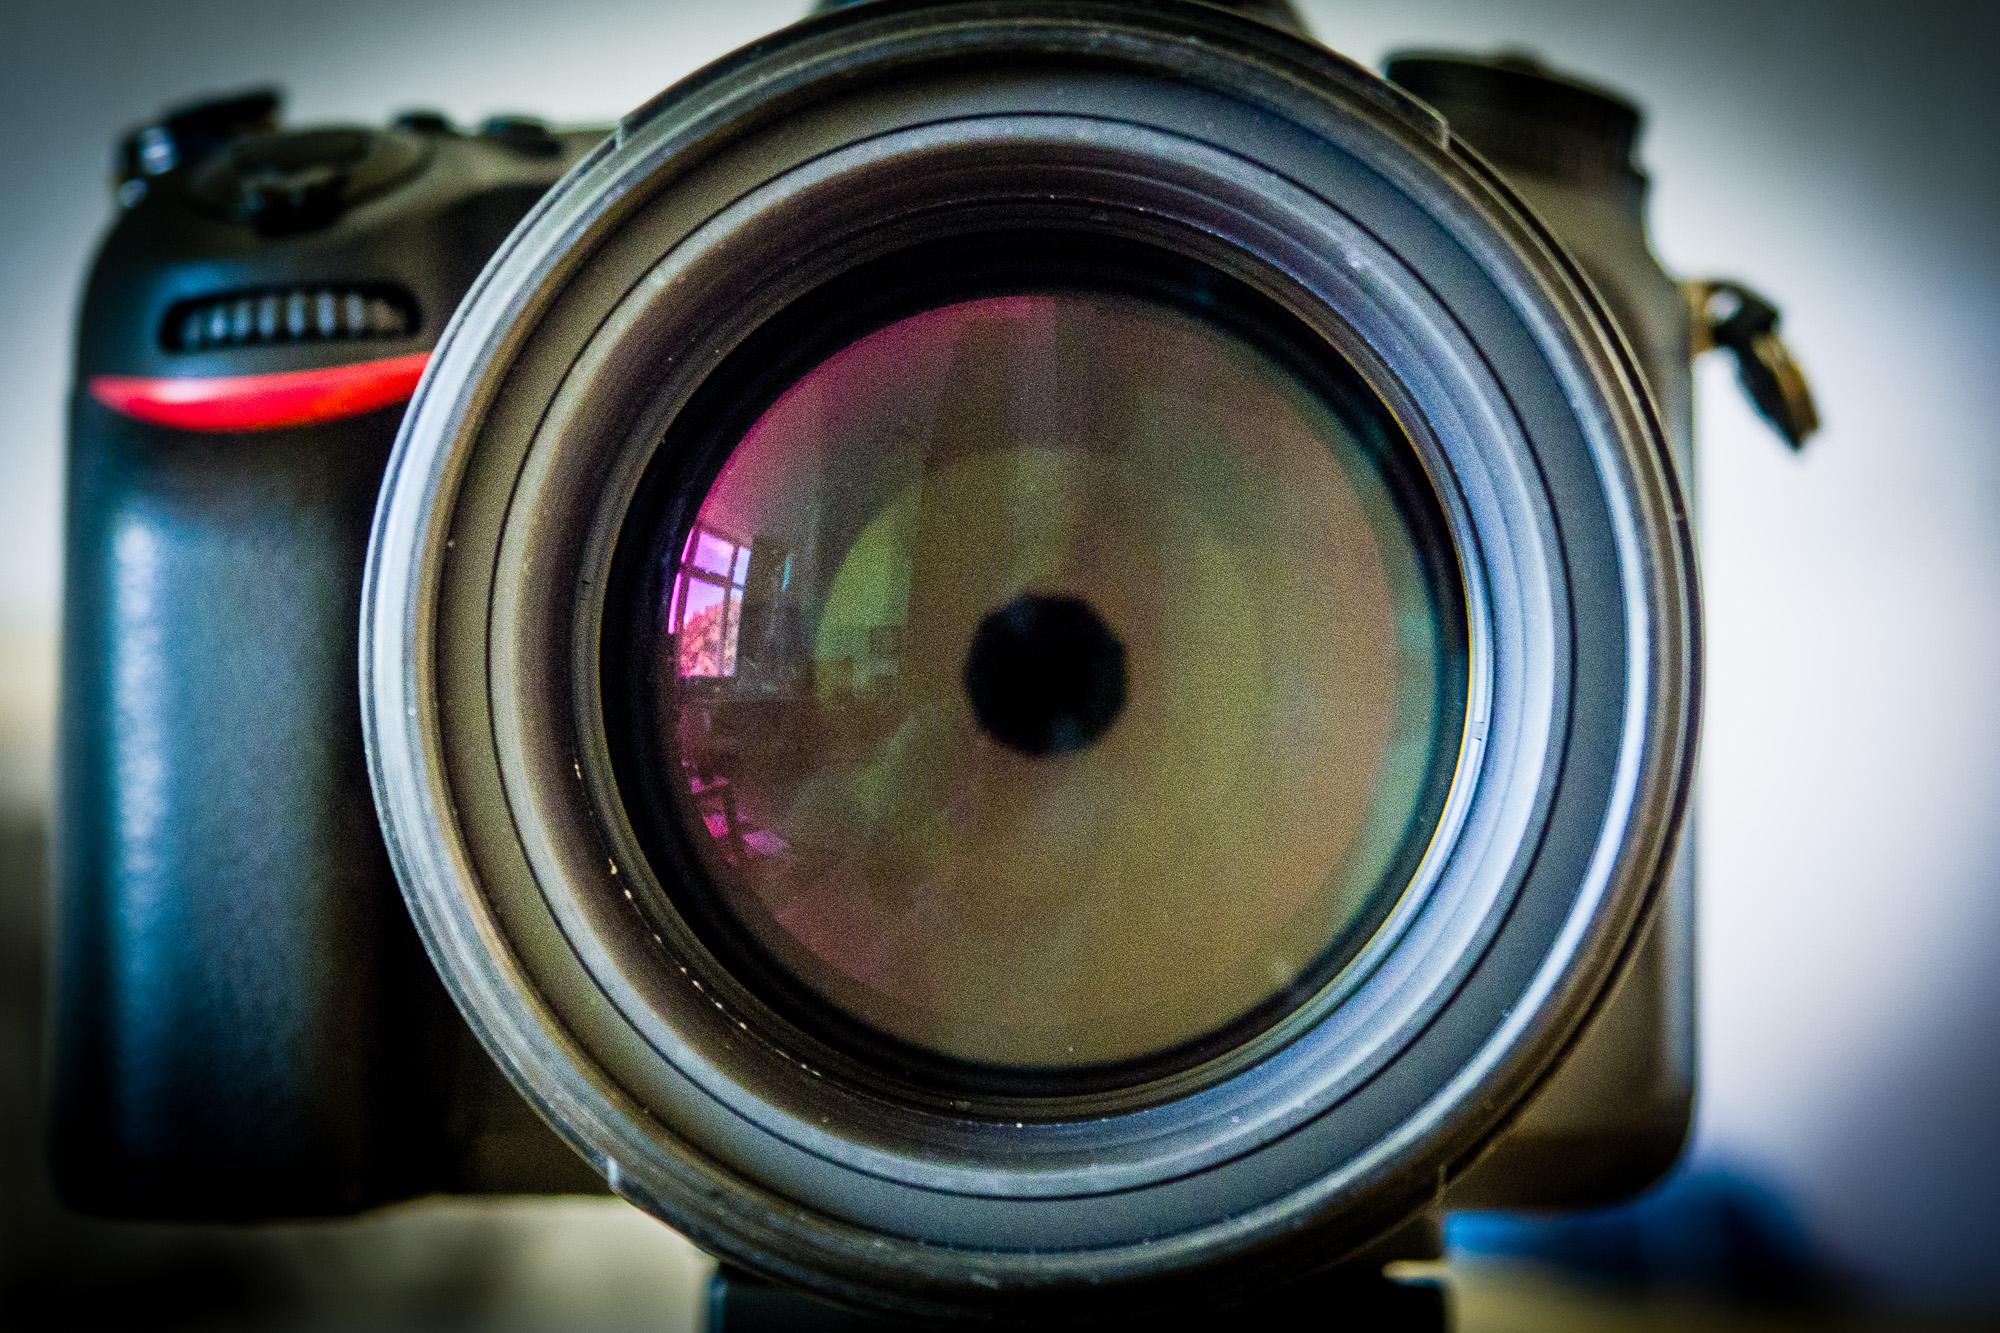 Nikon 85mm mit Blende 6.3, (Foto copyright - Frank Weber - Berlin - fotologbuch.de)